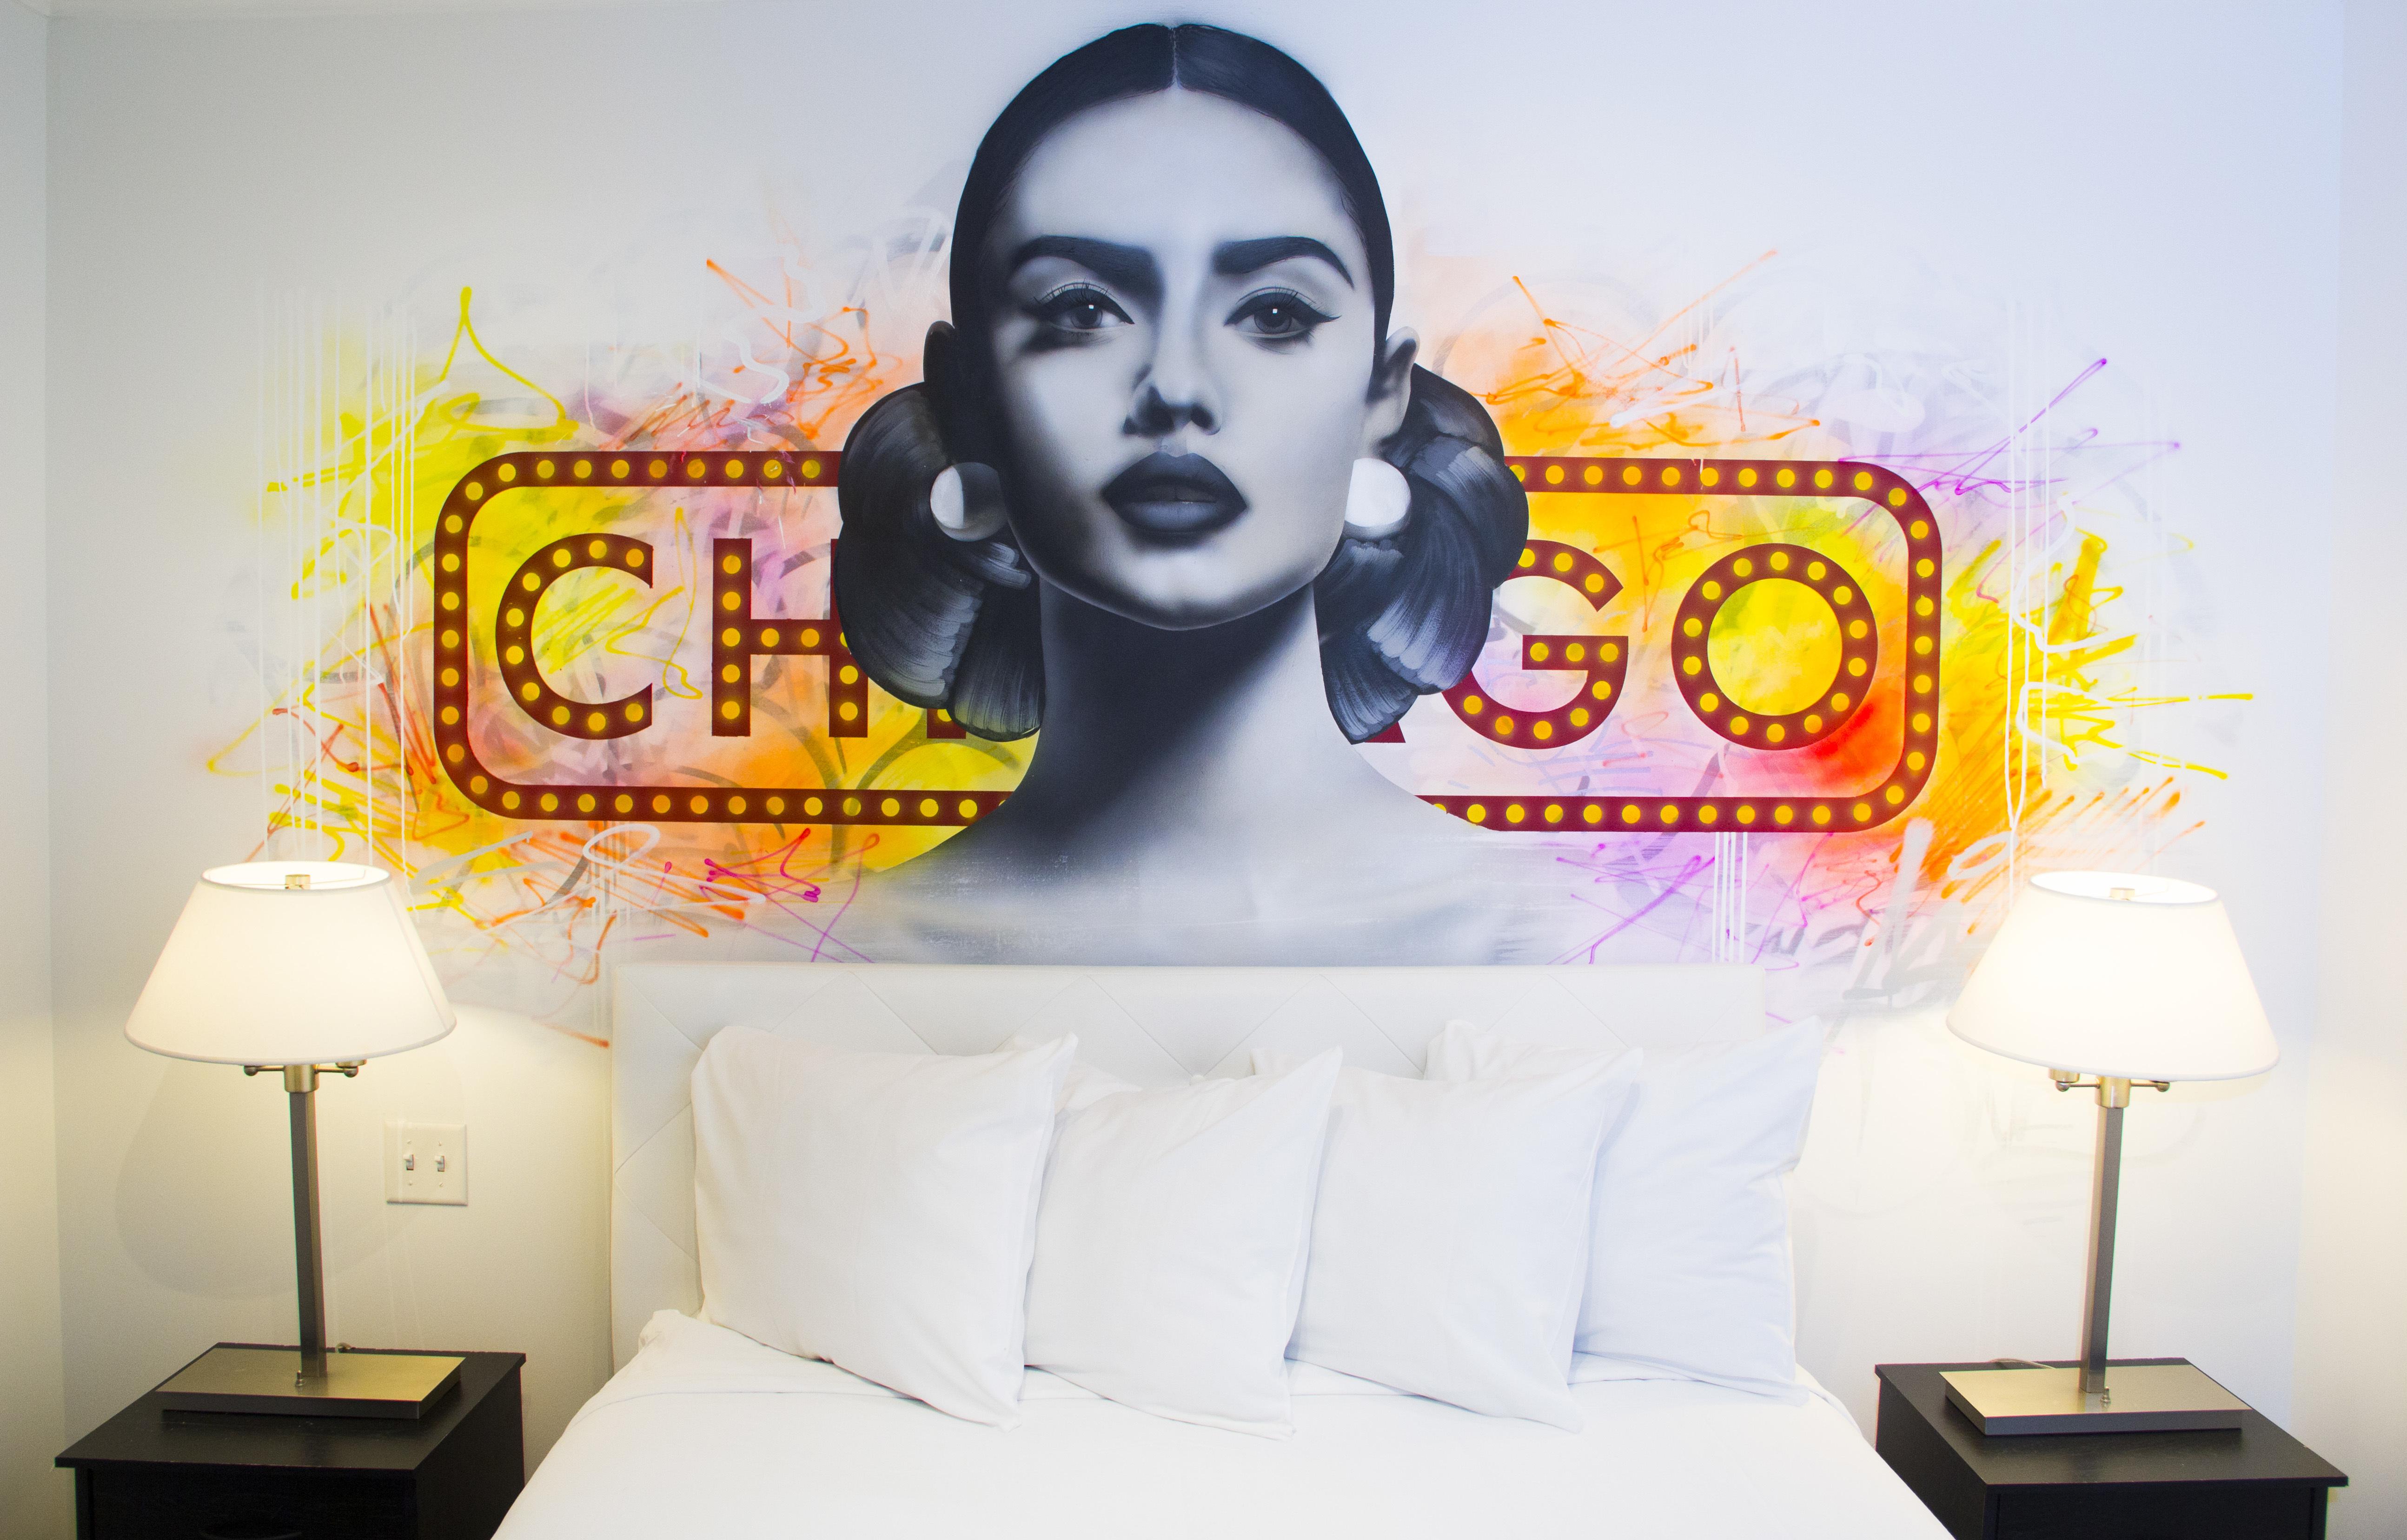 Mural_Hotel_Hotel_Chicago_West_Loop.jpg?mtime=20191018153008#asset:107112